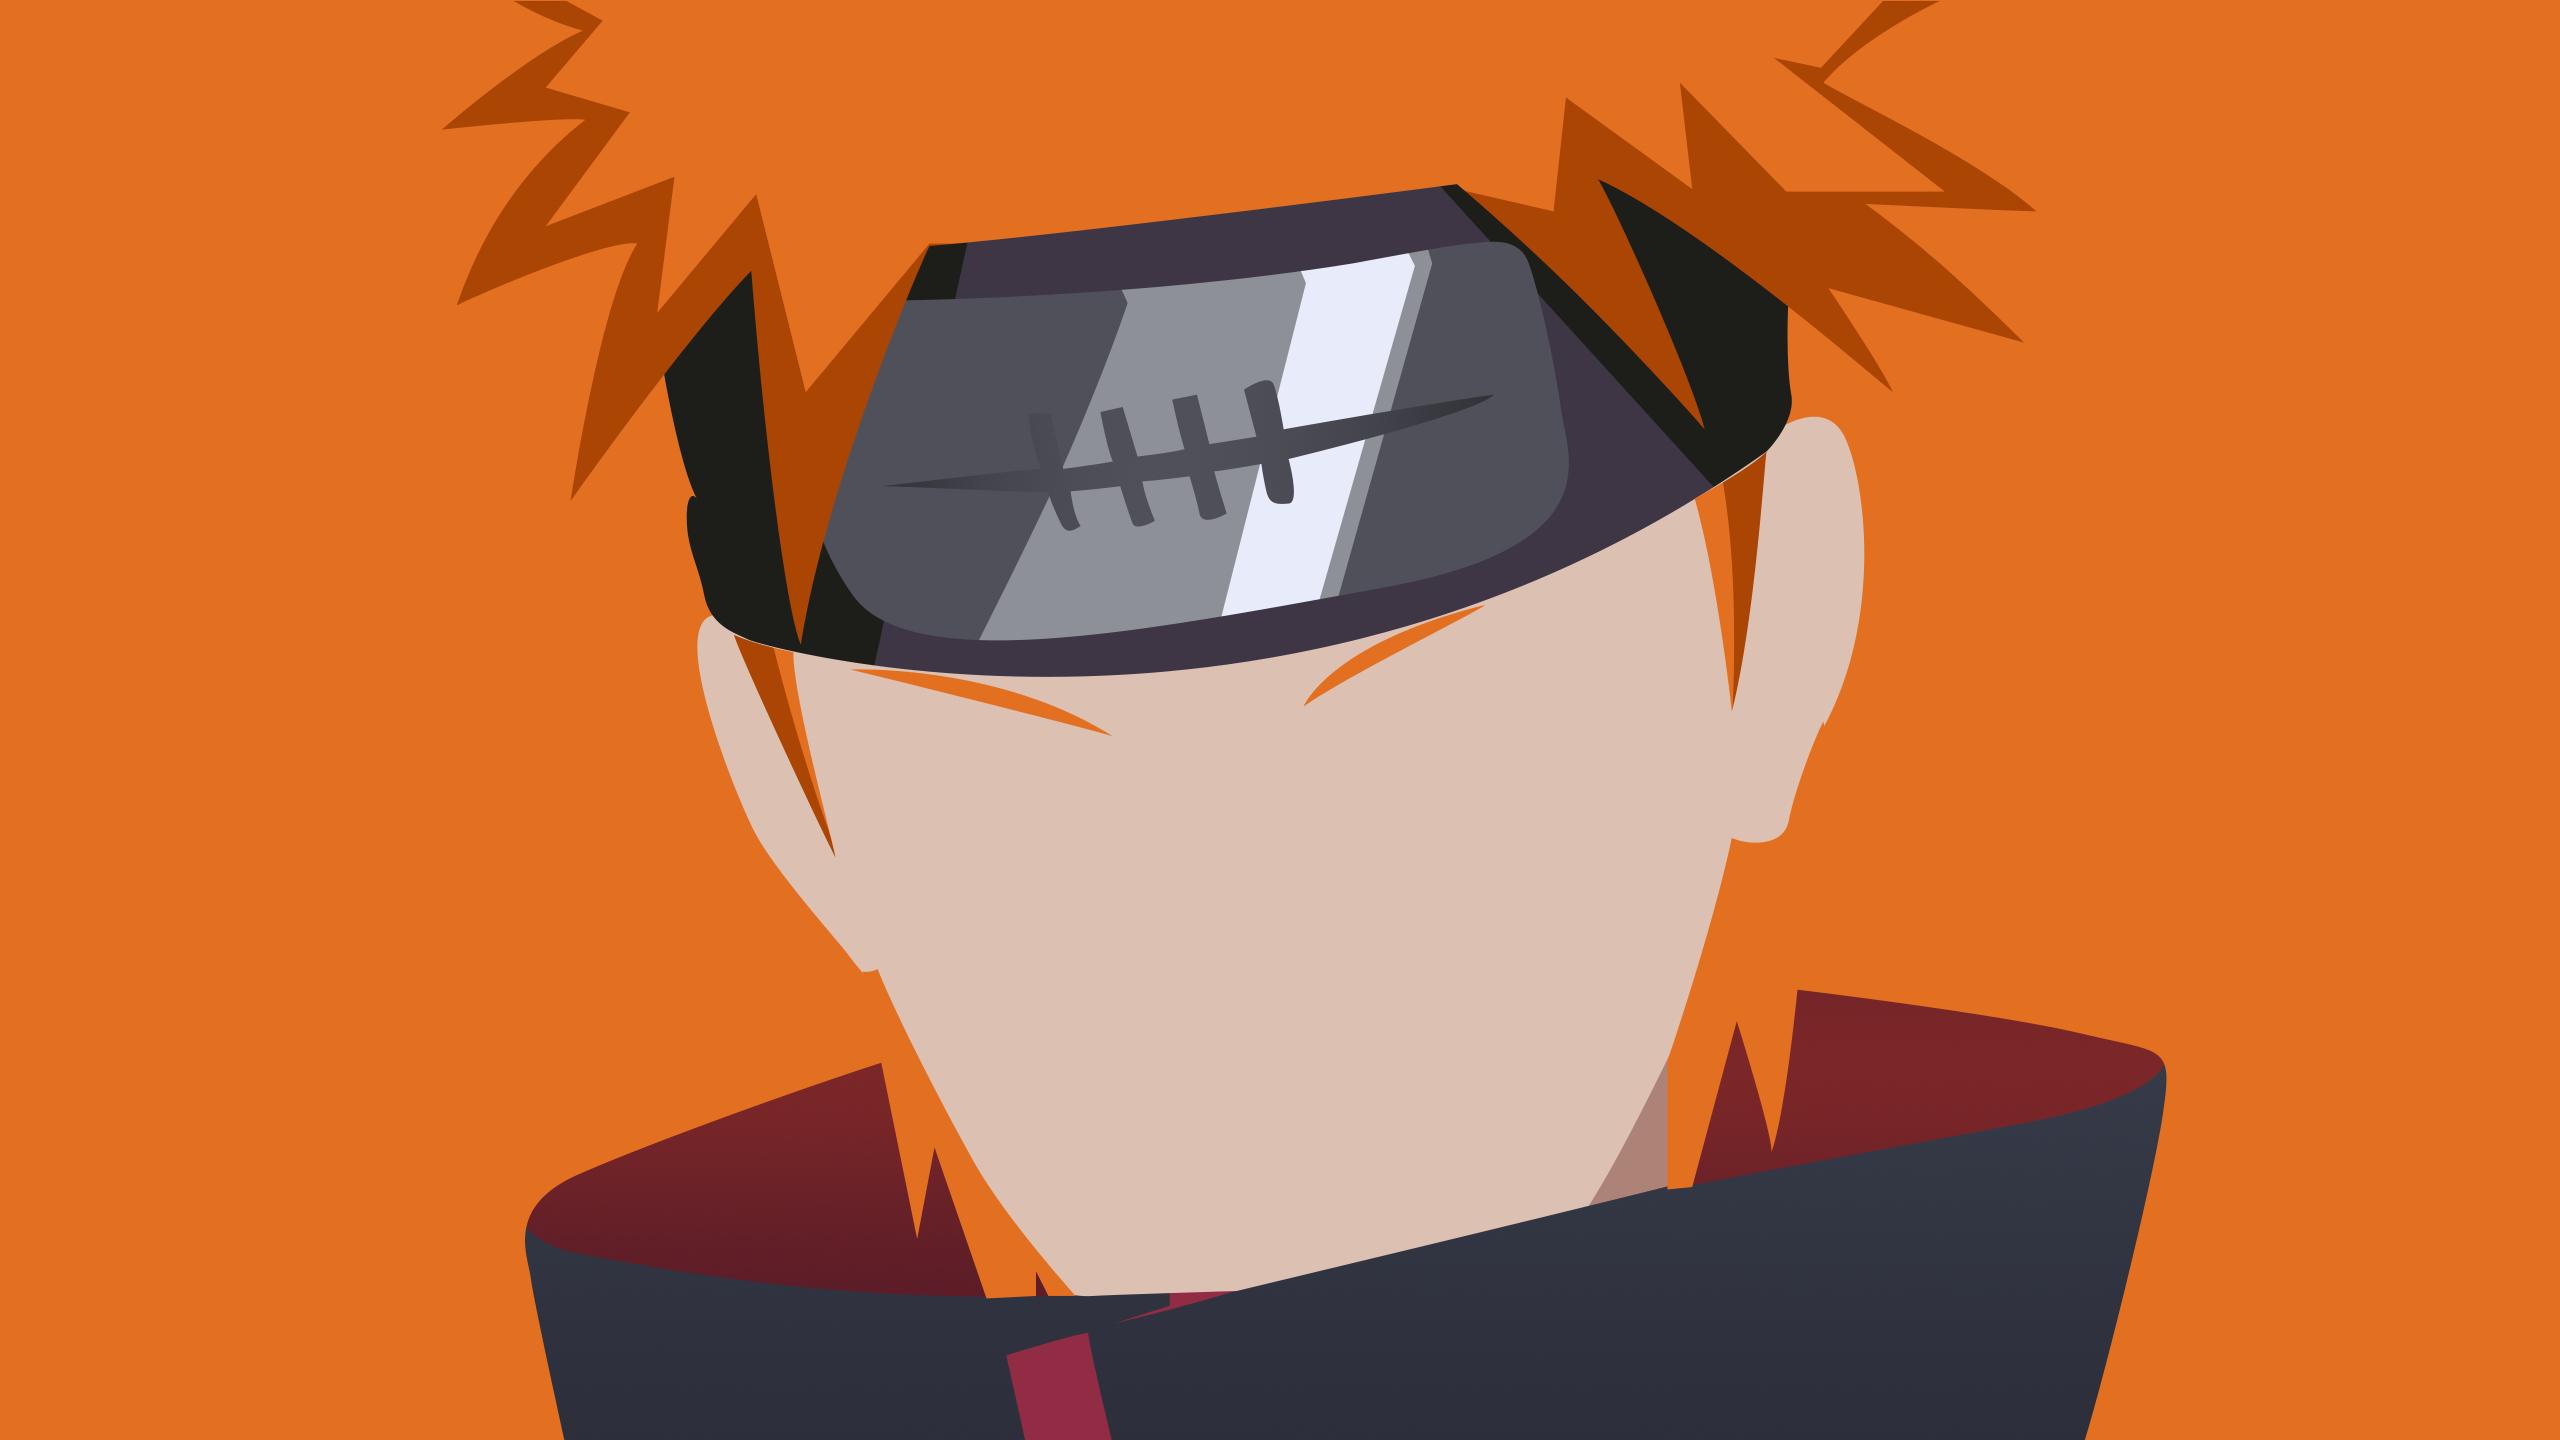 2560x1080 Pain Naruto 2560x1080 Resolution Wallpaper, HD ...